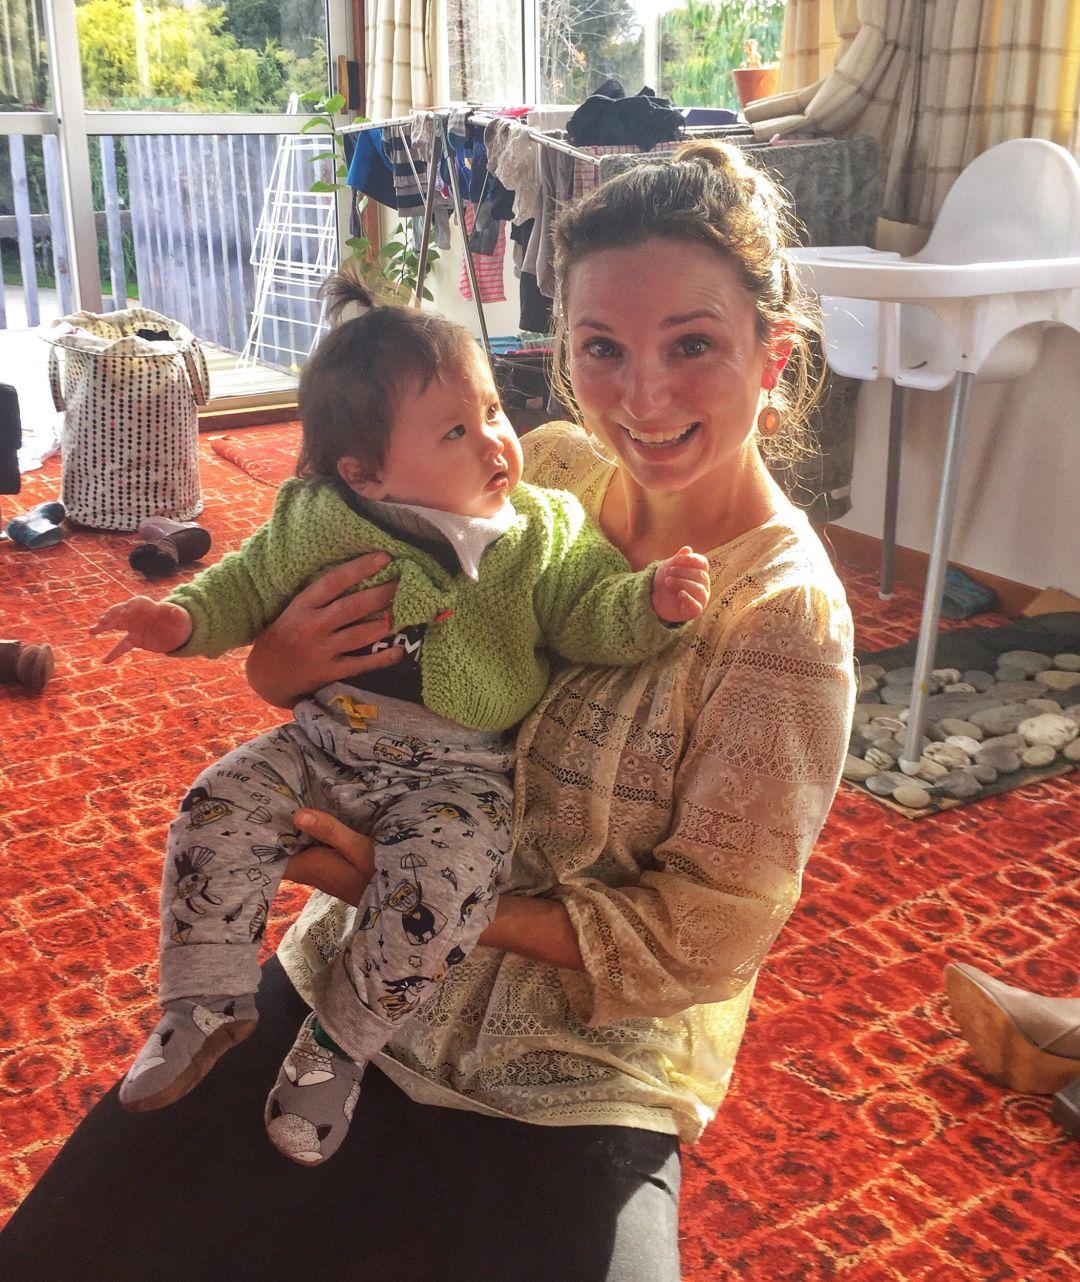 Podcast Kate Callaghan aka The Holistic Nutritionist